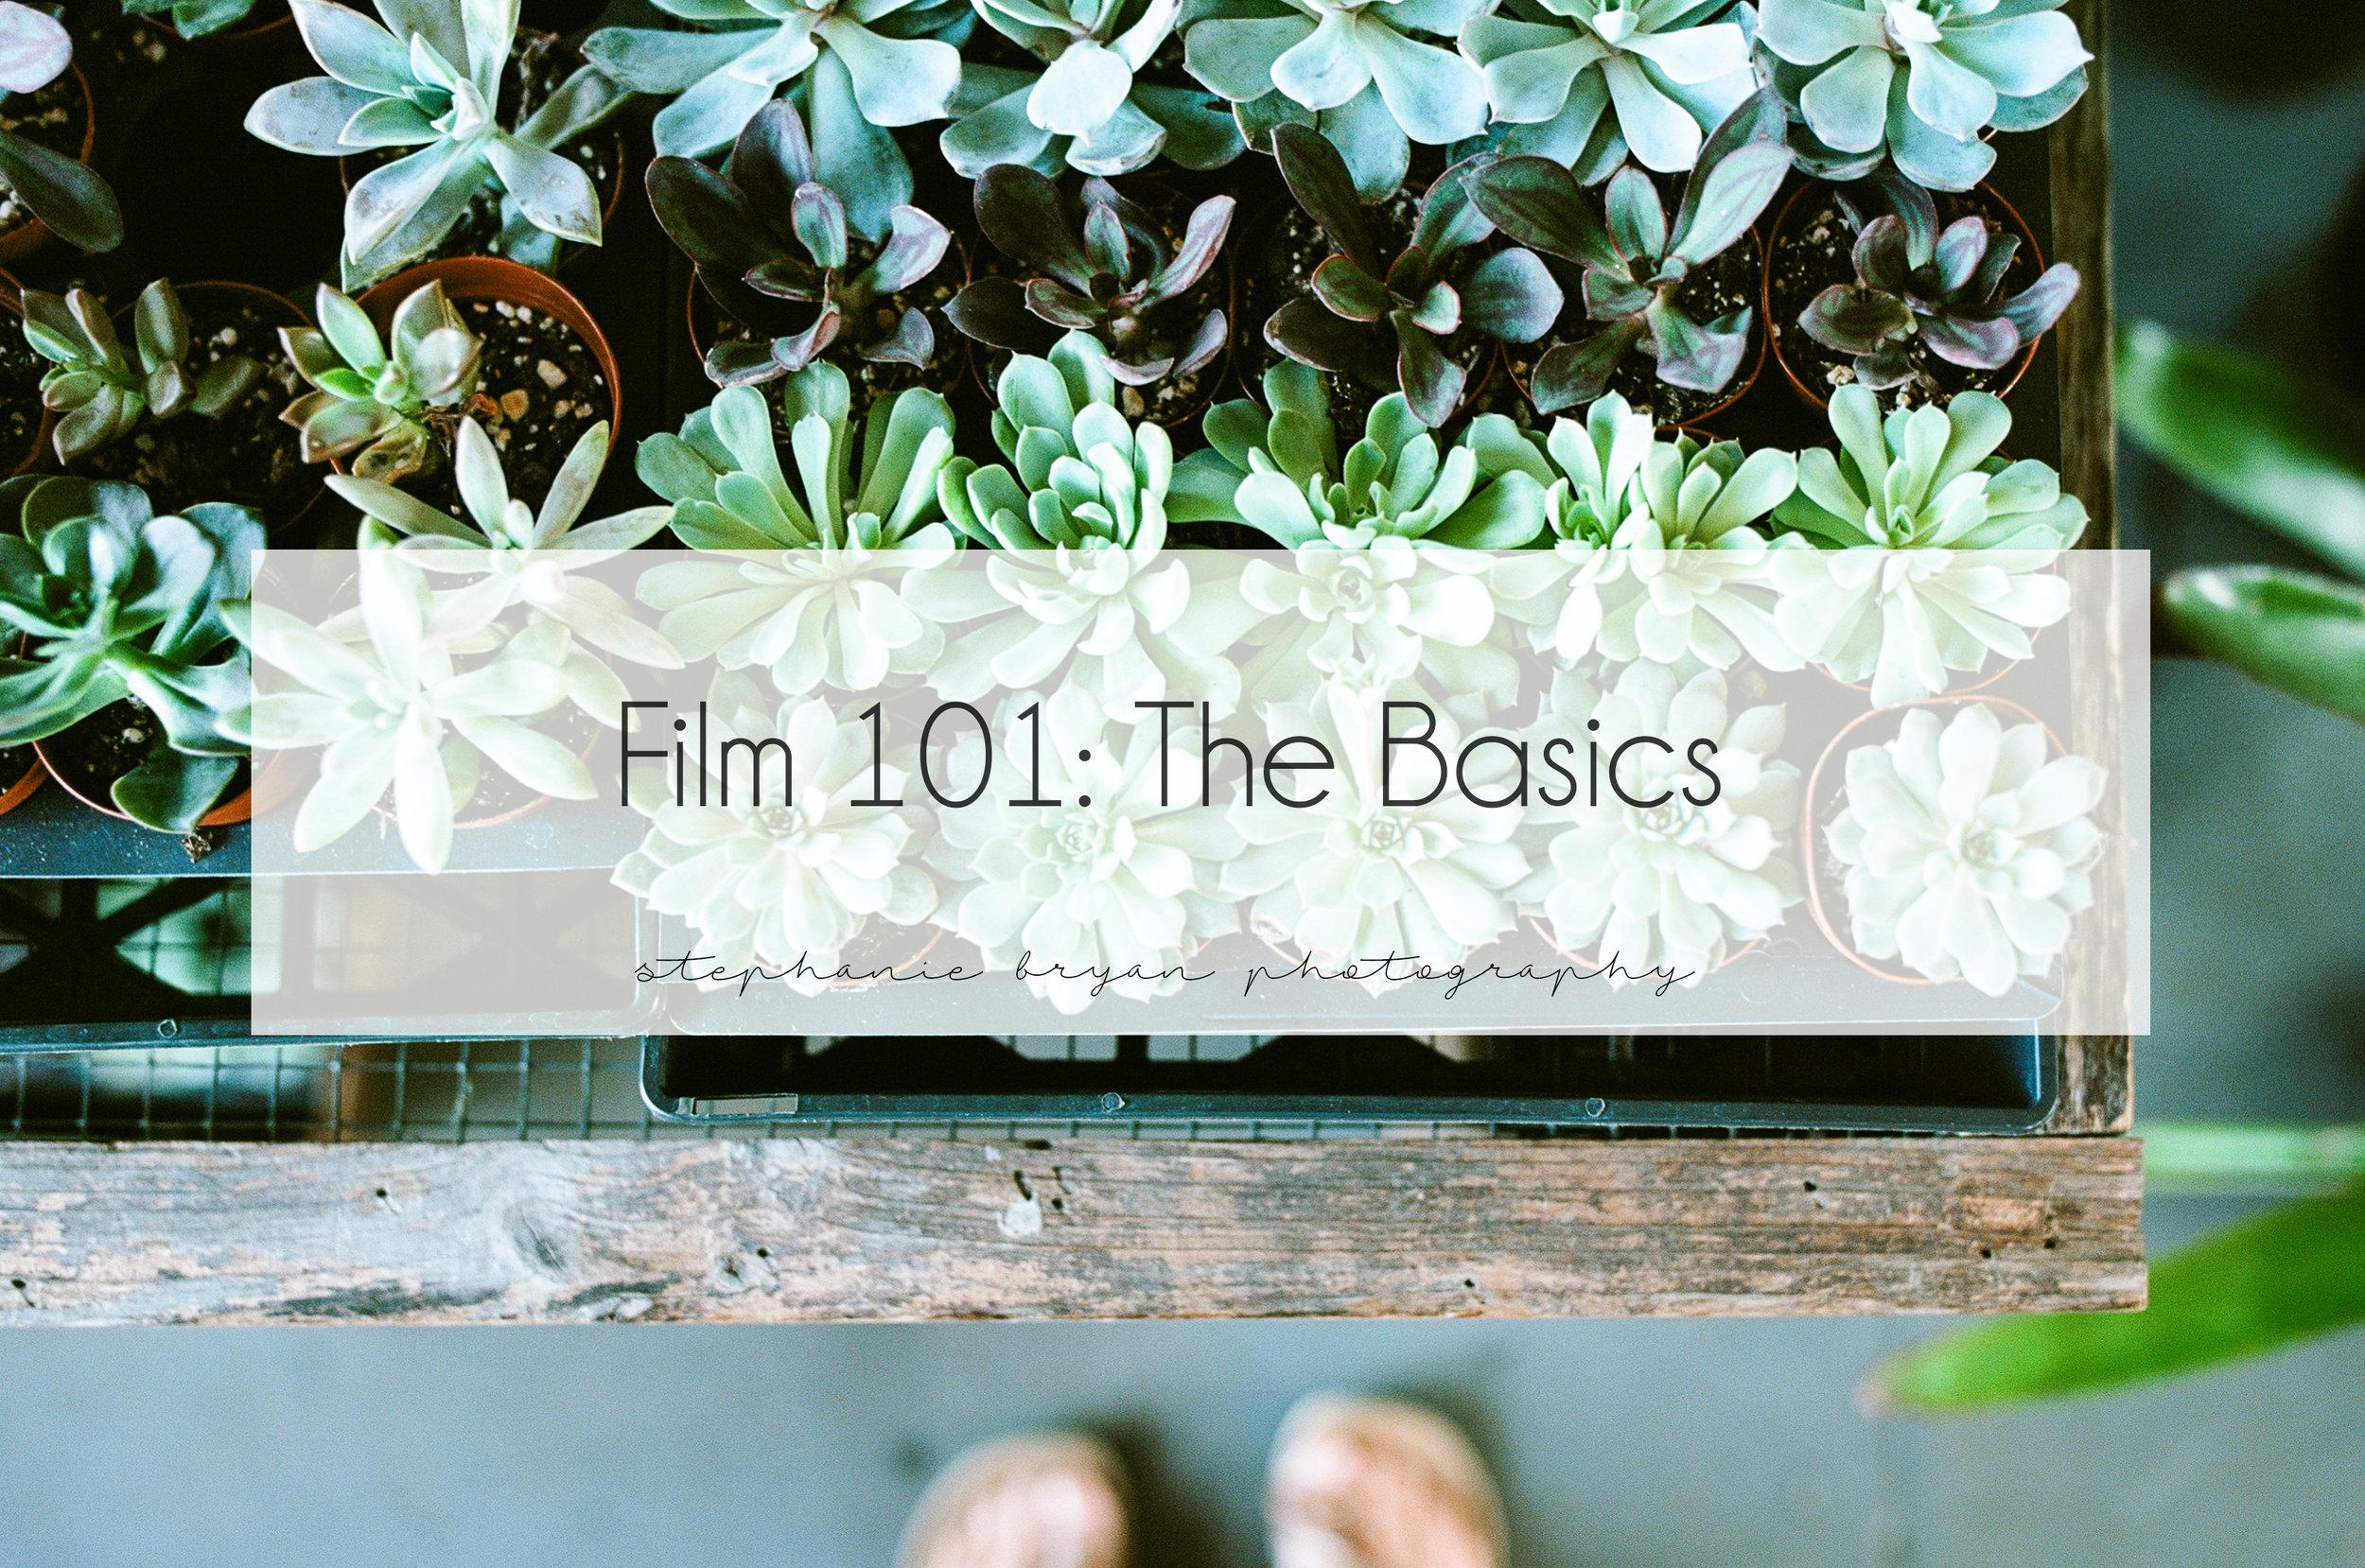 film-101-the-basics-film-camera-analogue-photography-tutorial.jpg